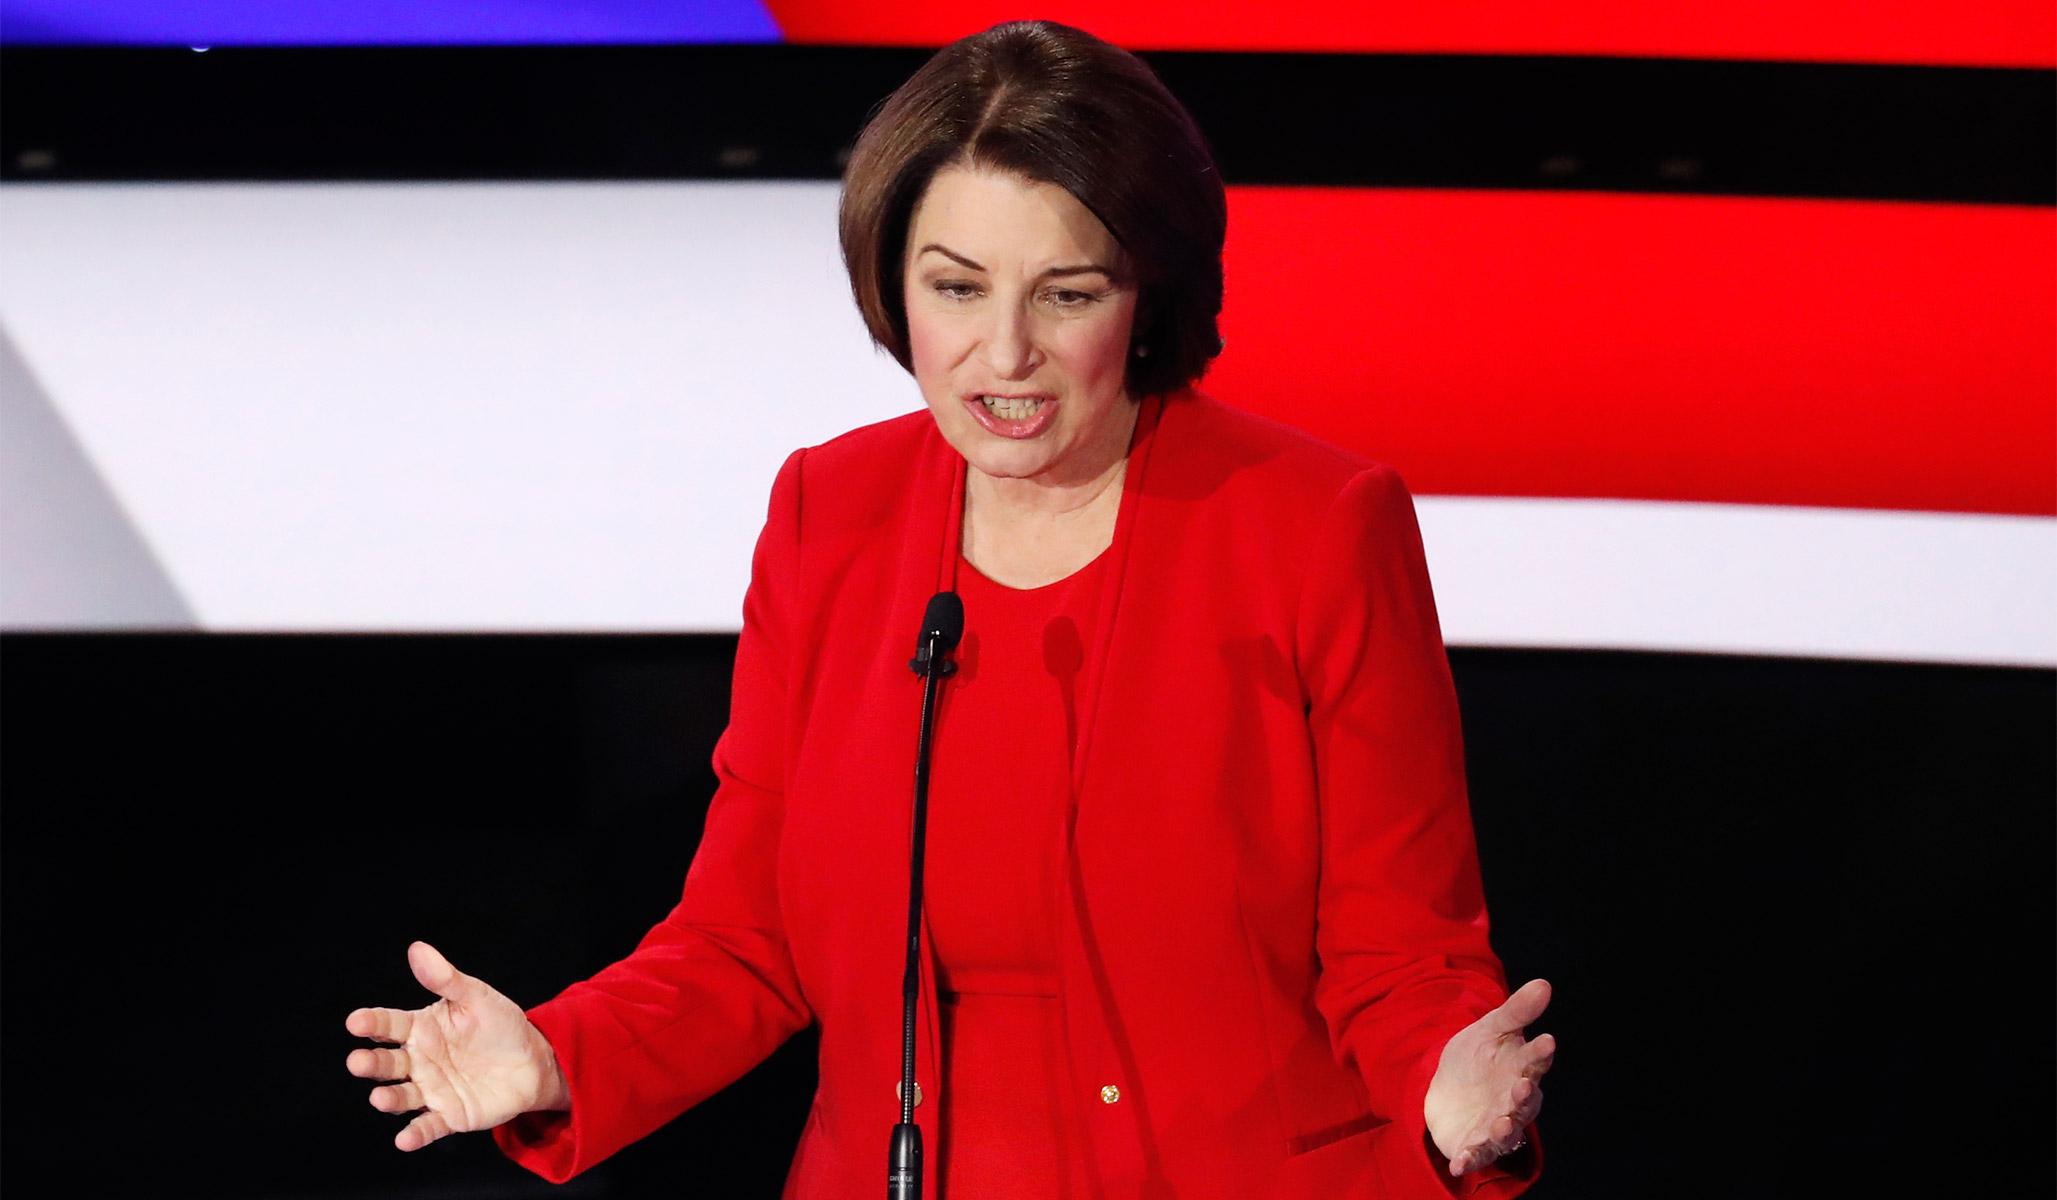 In Last Democratic Debate before Iowa, Klobuchar's Failure to Catch Fire Is Good News for Biden